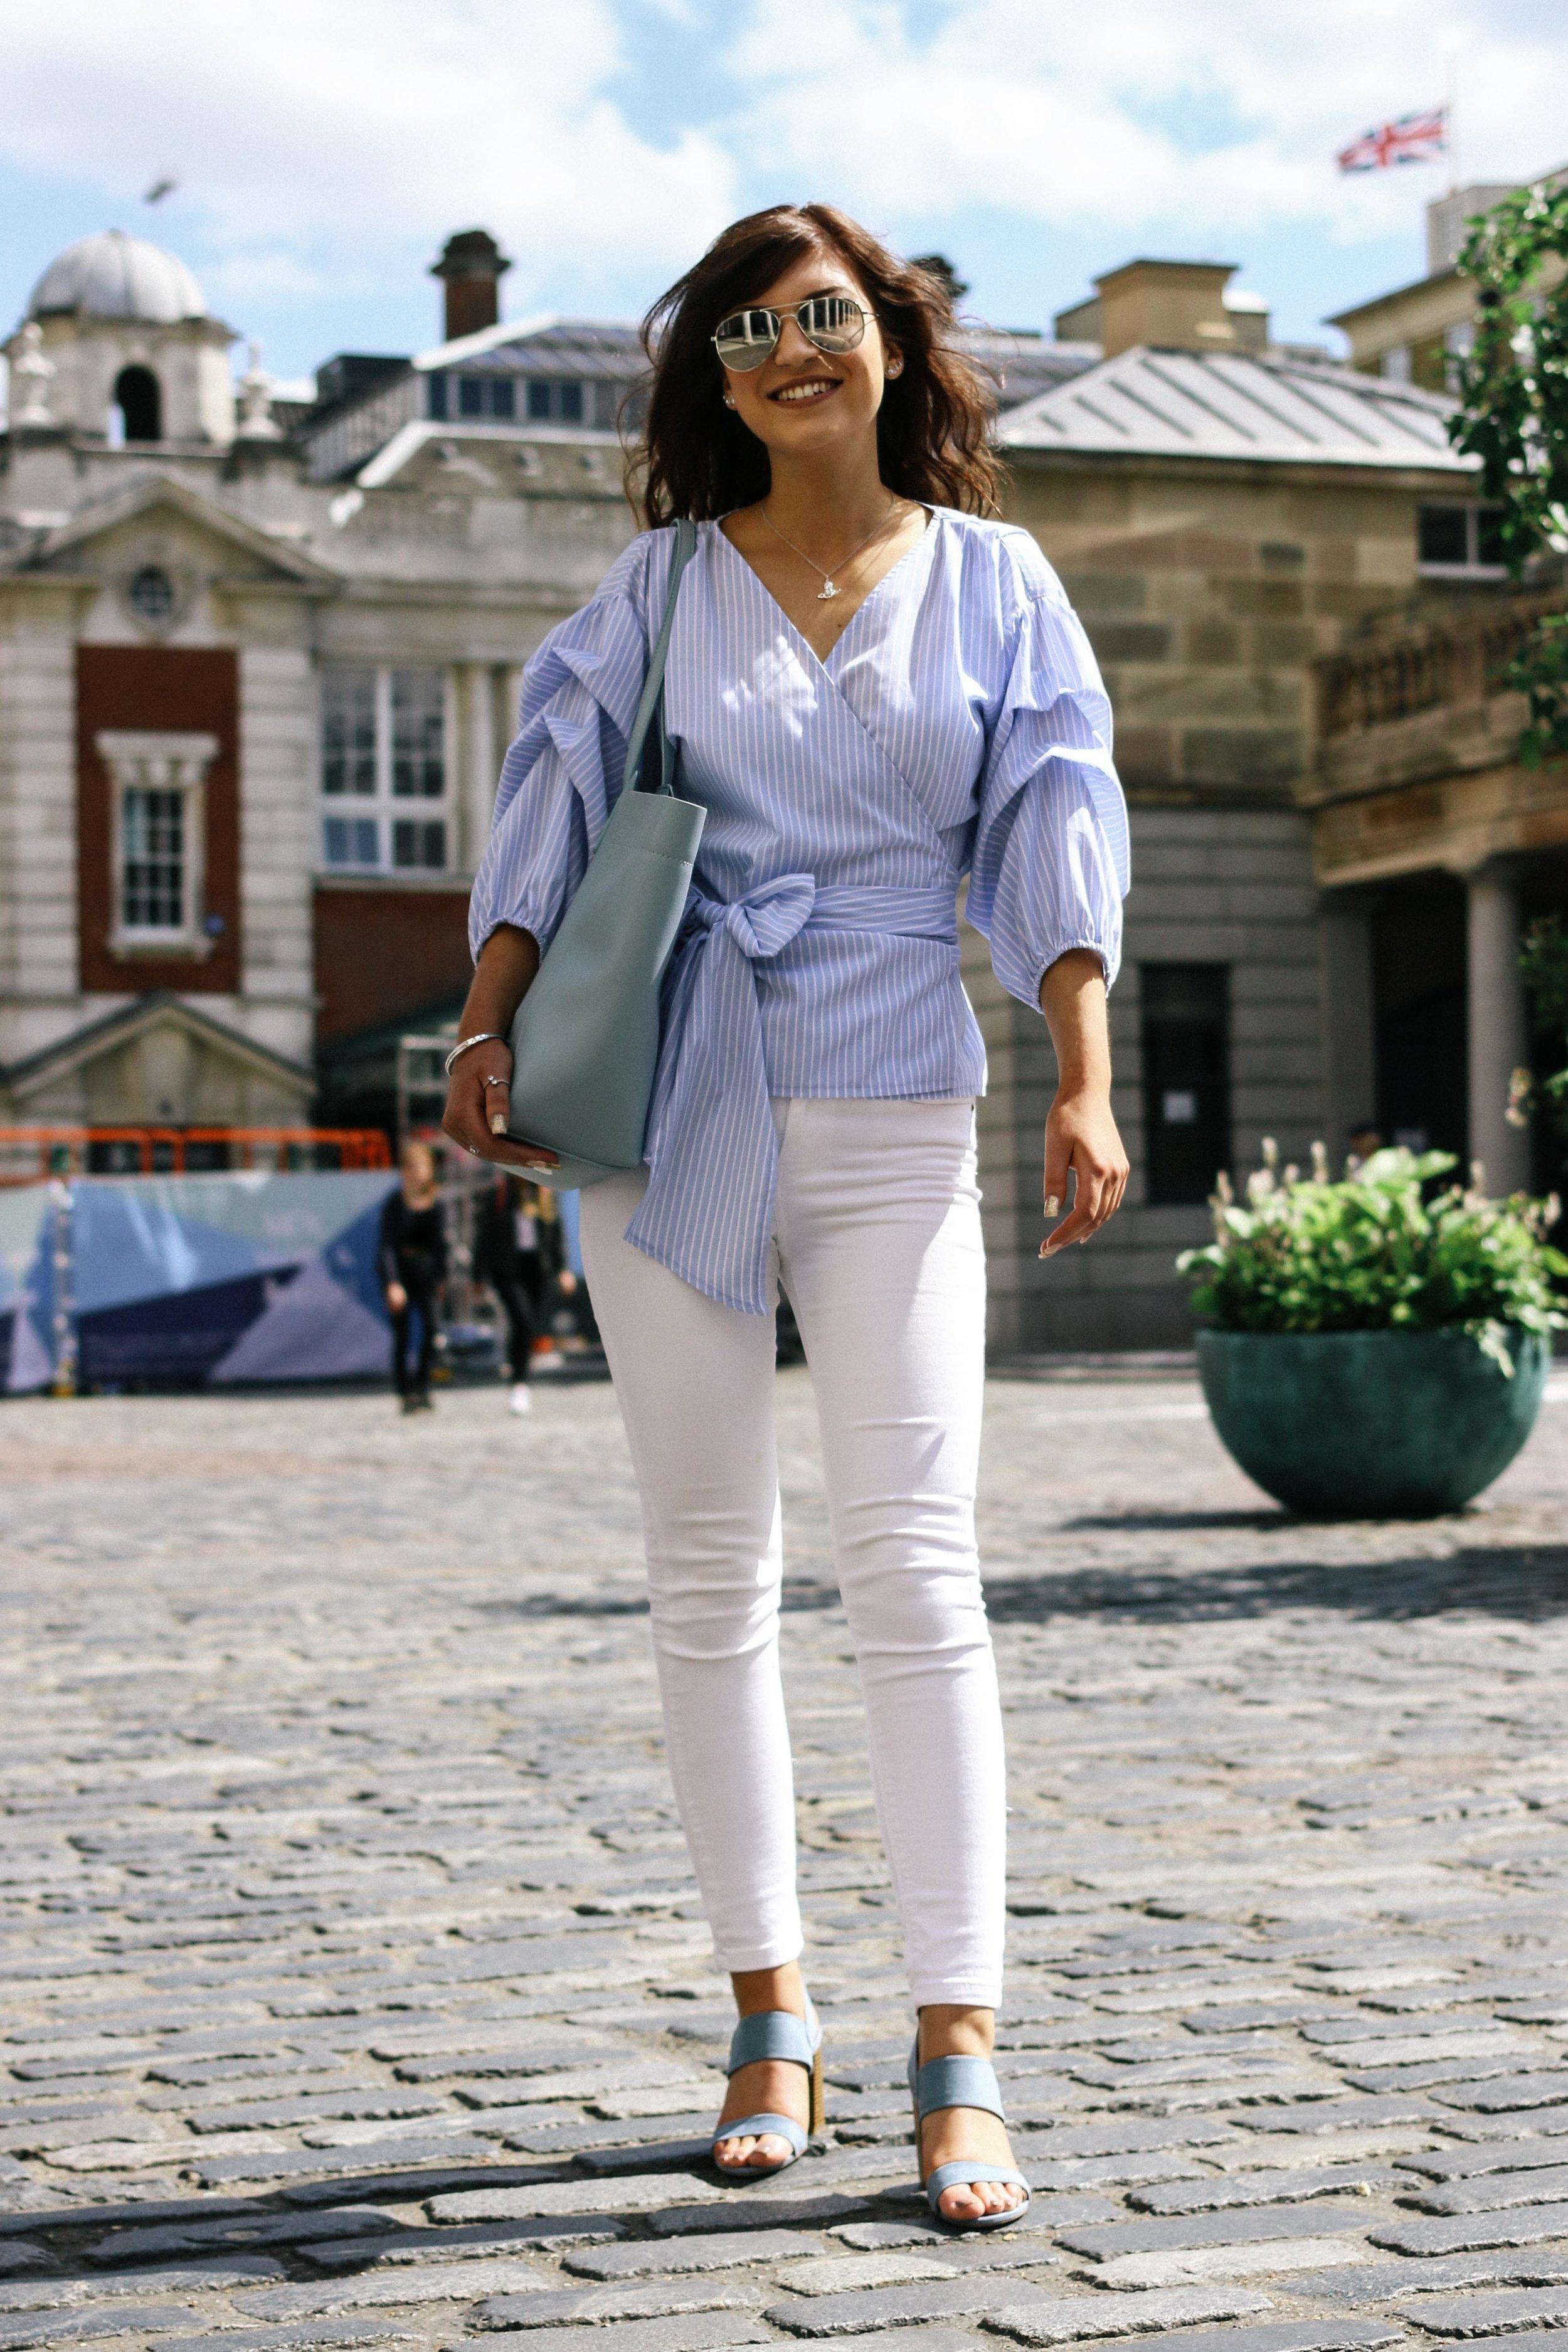 Street fashion stories_Imaginealady